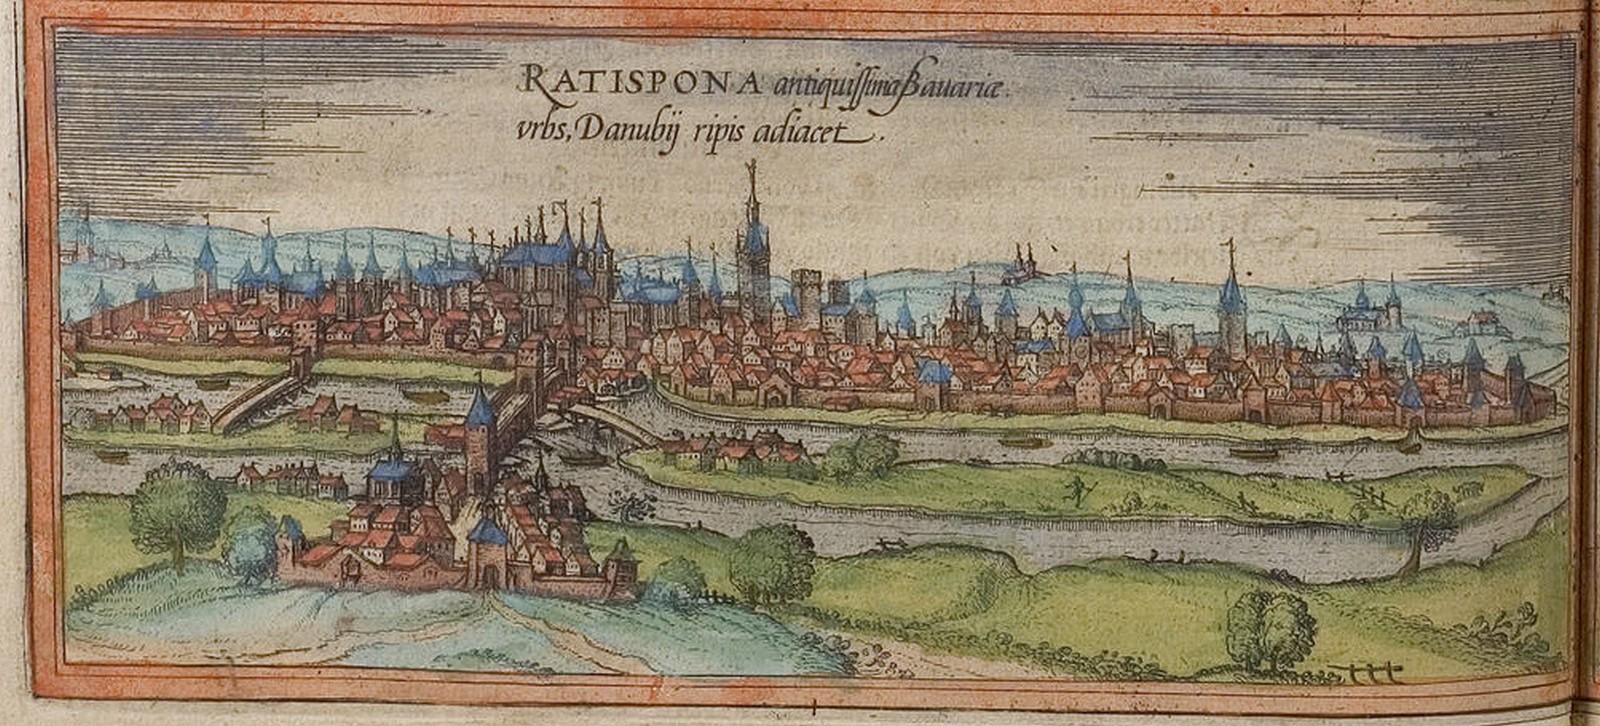 Imperial Regensburg - Sheet3